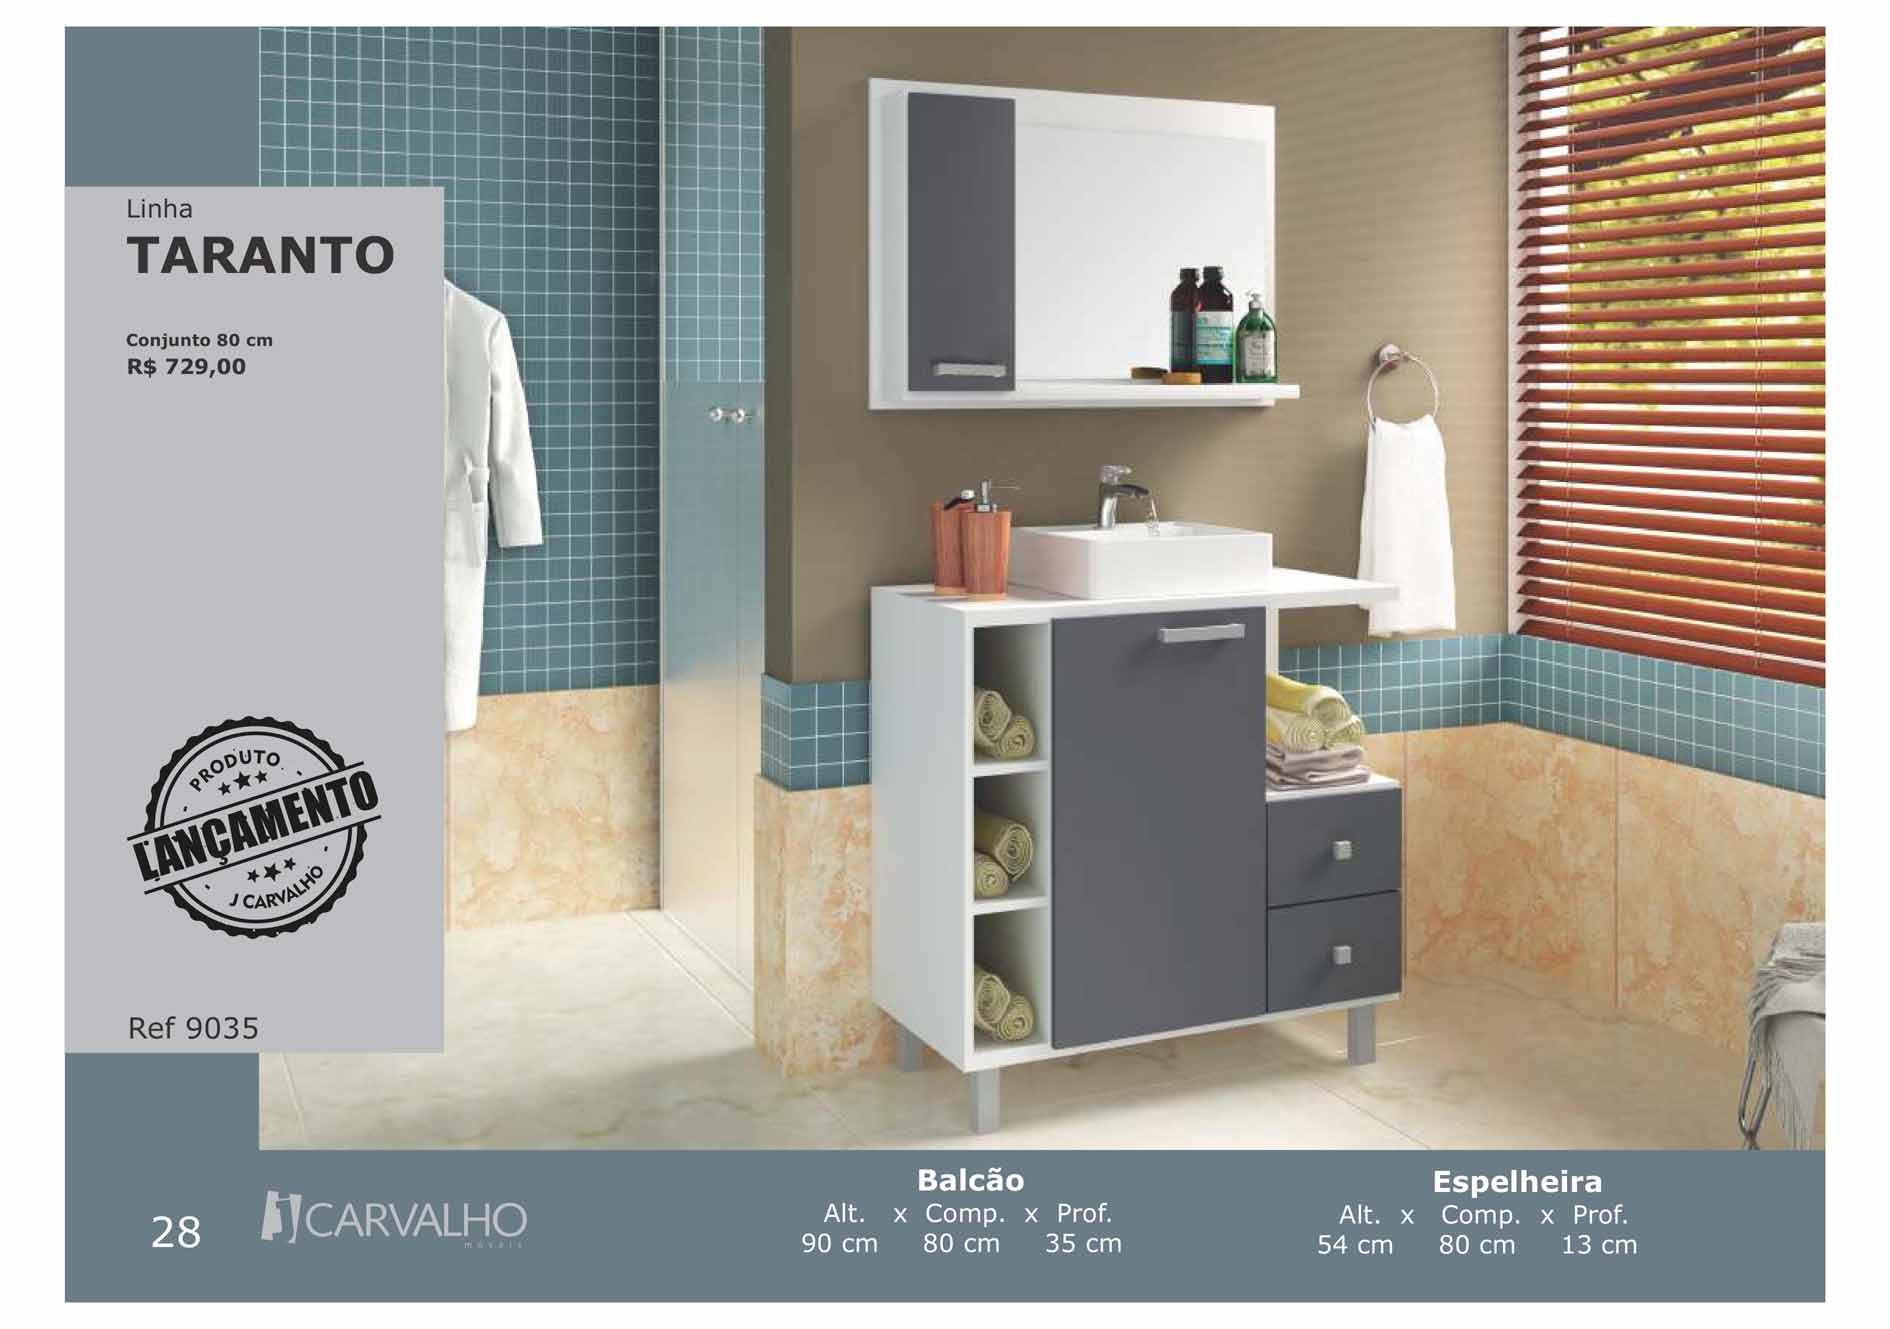 Taranto – Ref 9035